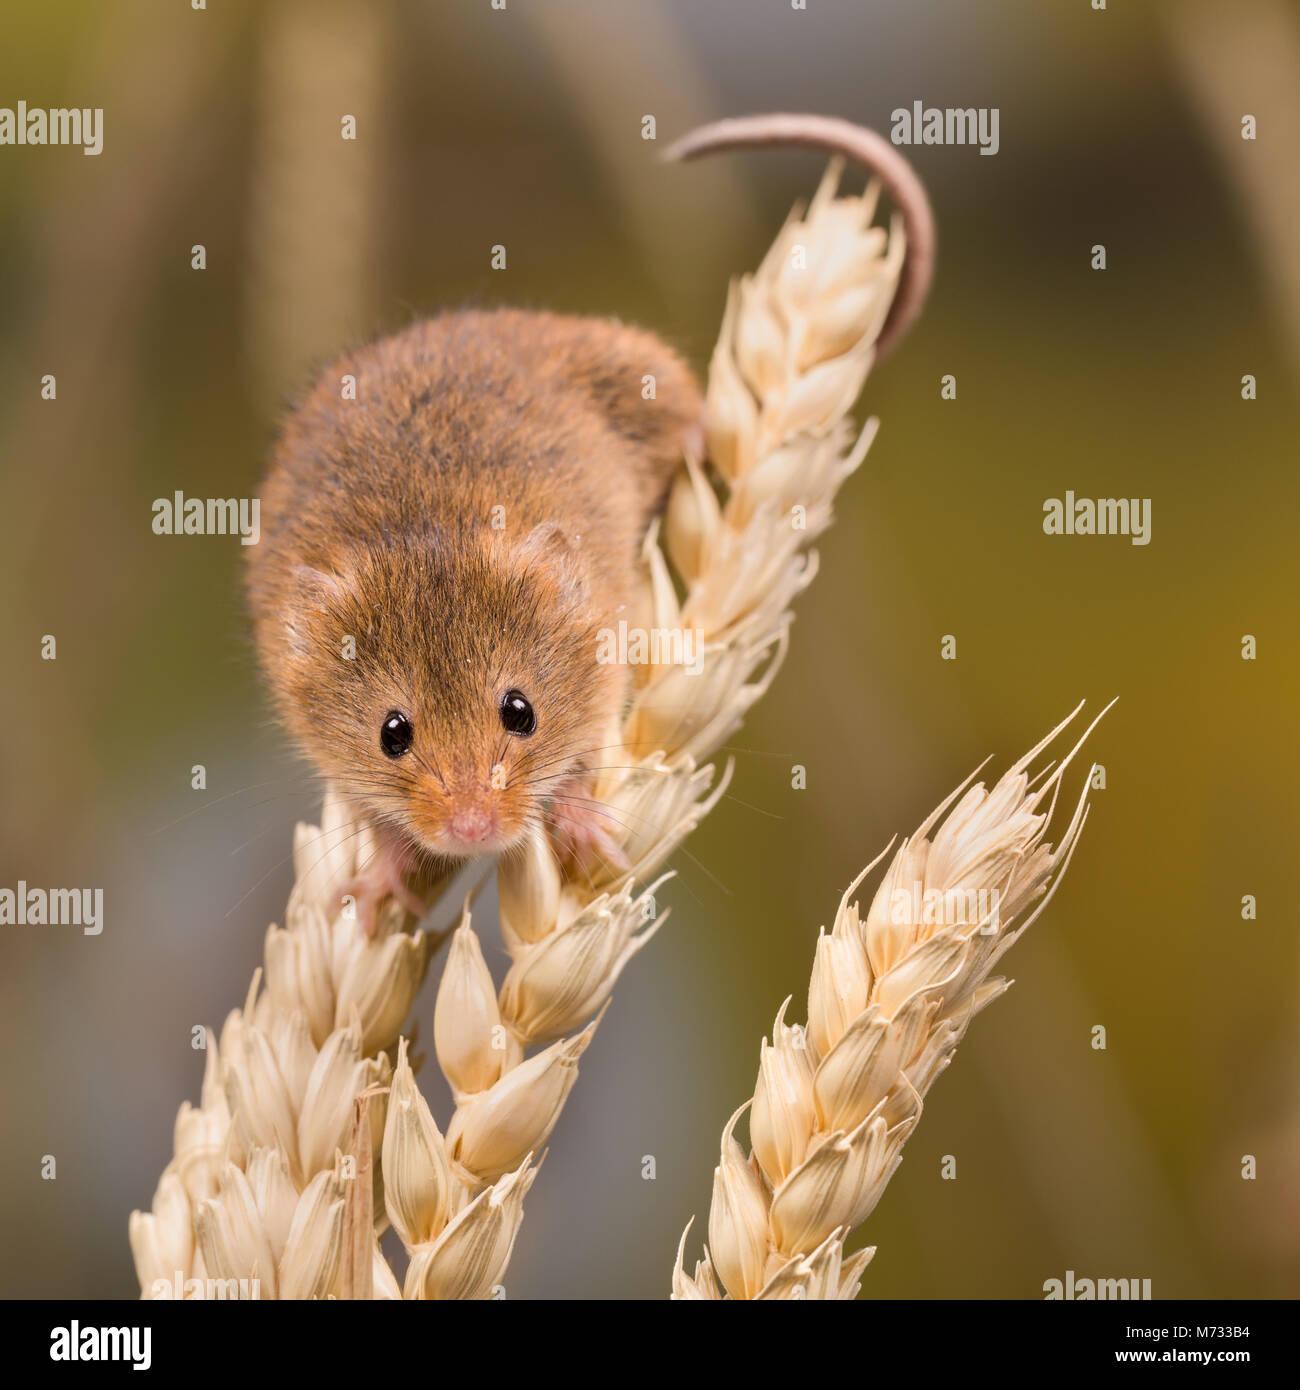 Micromys Minutus oder Harvest Maus im Weizenfeld Stockbild